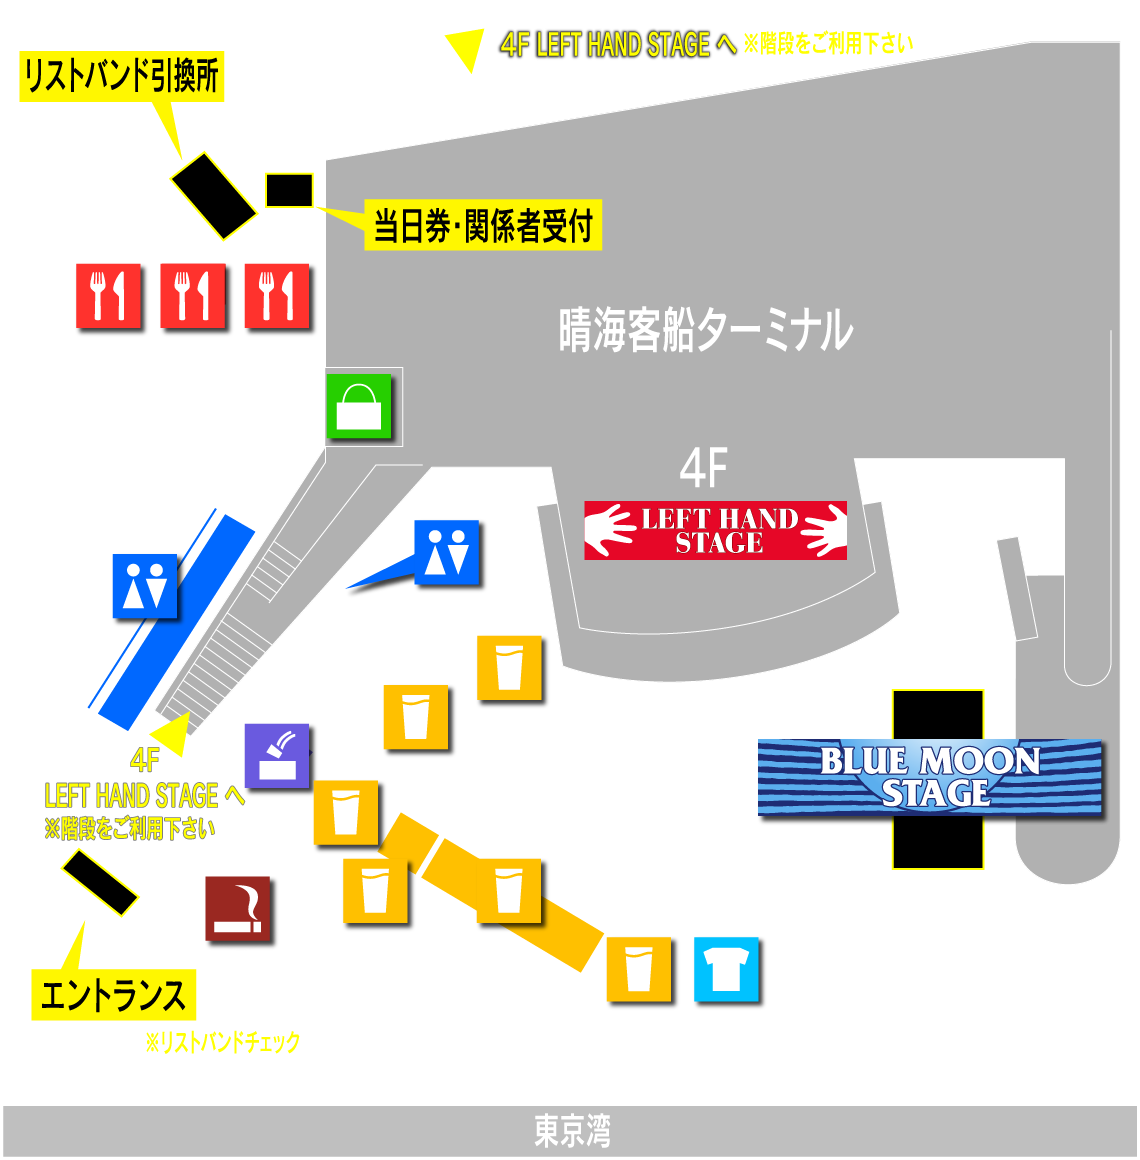 BLUE MOON STAGe エリア全体